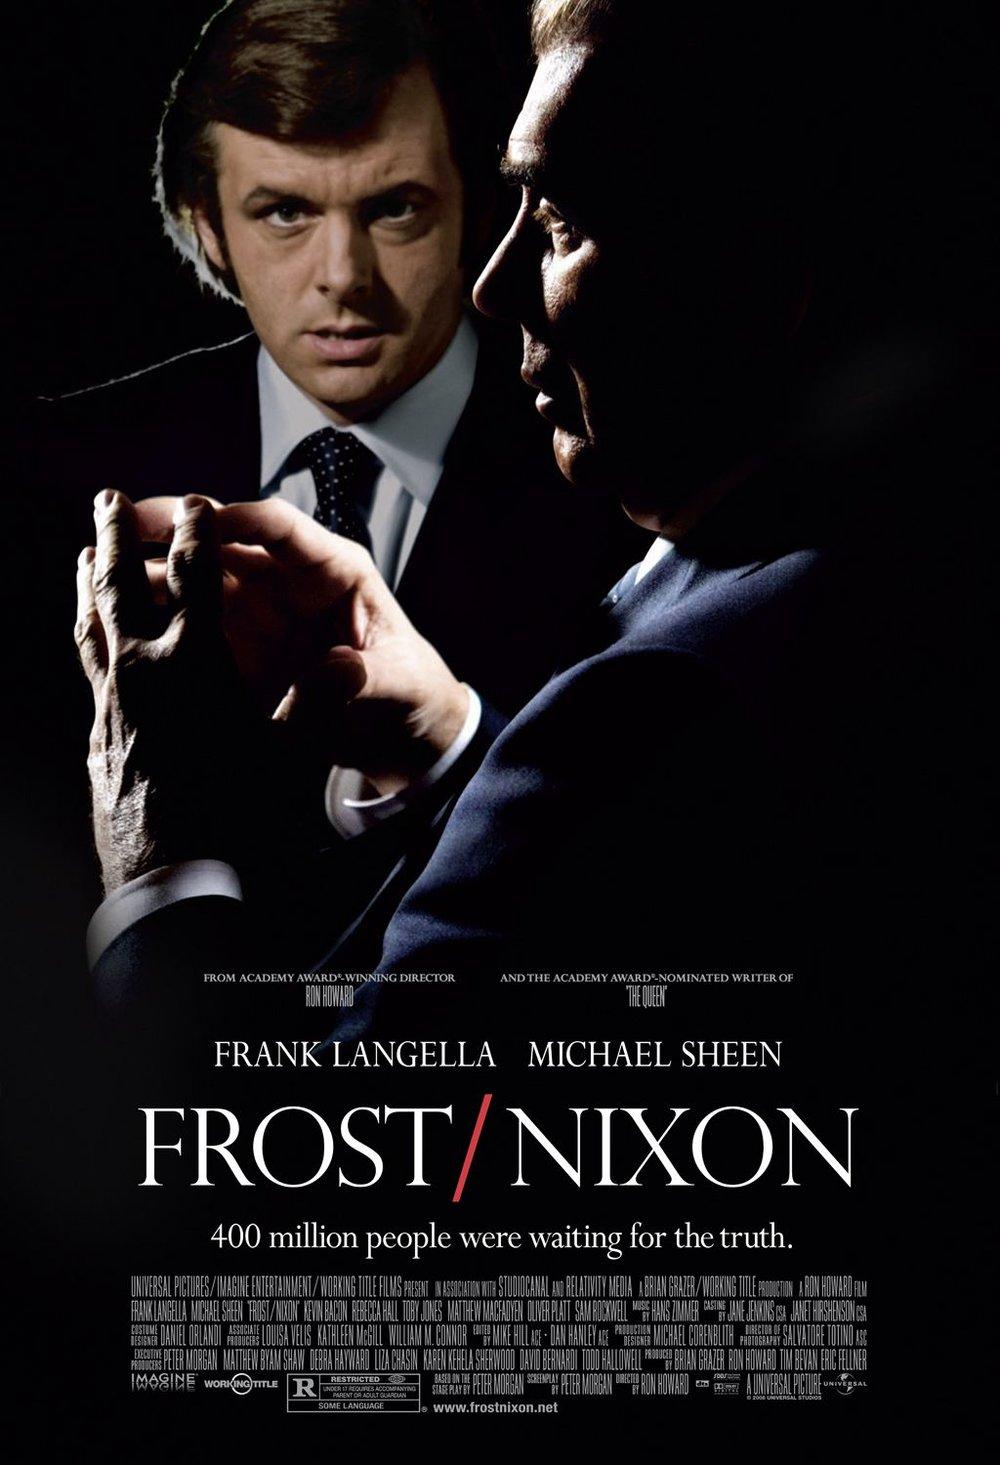 frost_nixon_xlg.jpg